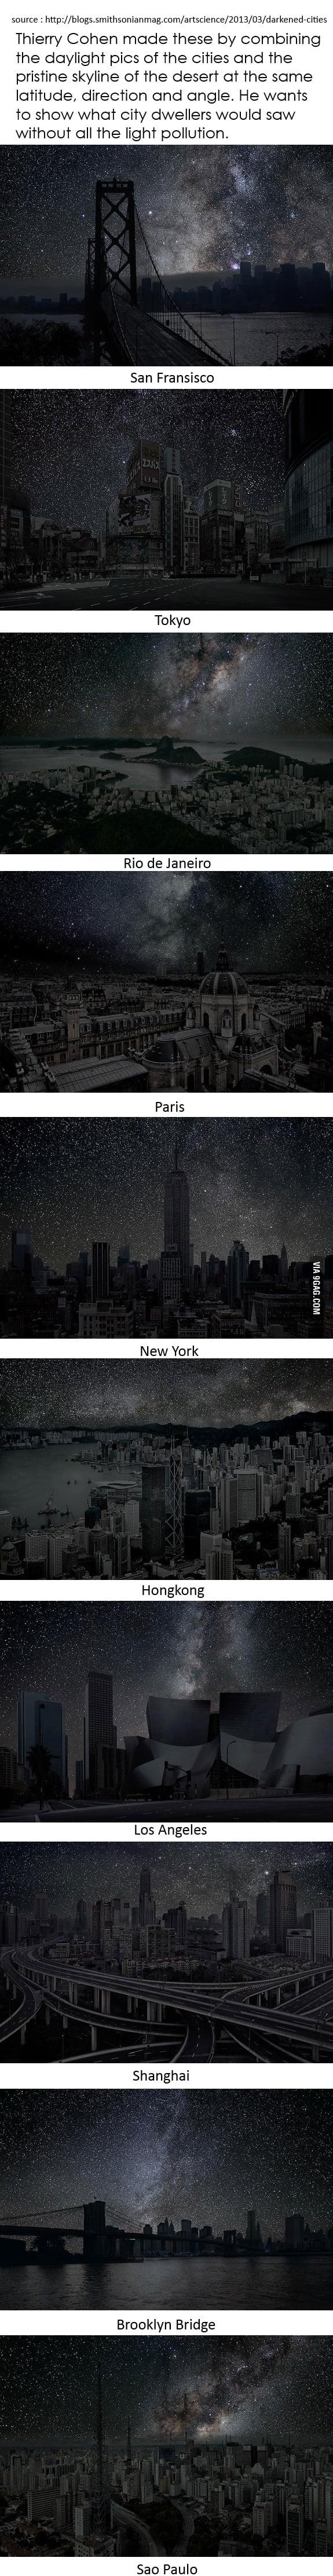 Cities' pure night skyline